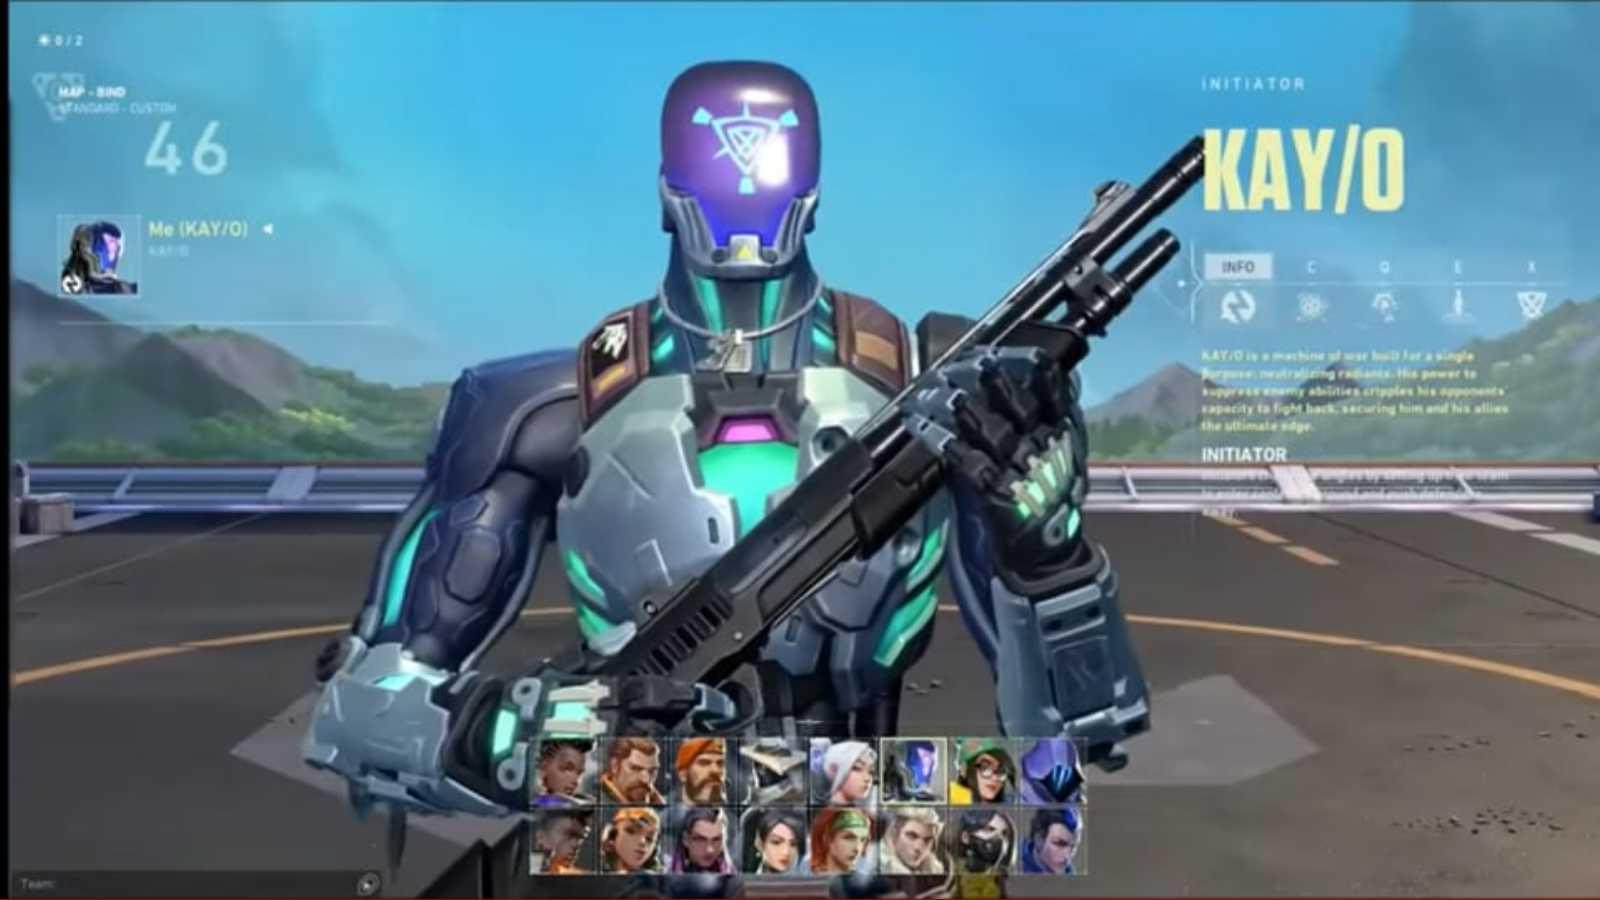 Valorant KAYO Gameplay: New Loading Screen Reveal